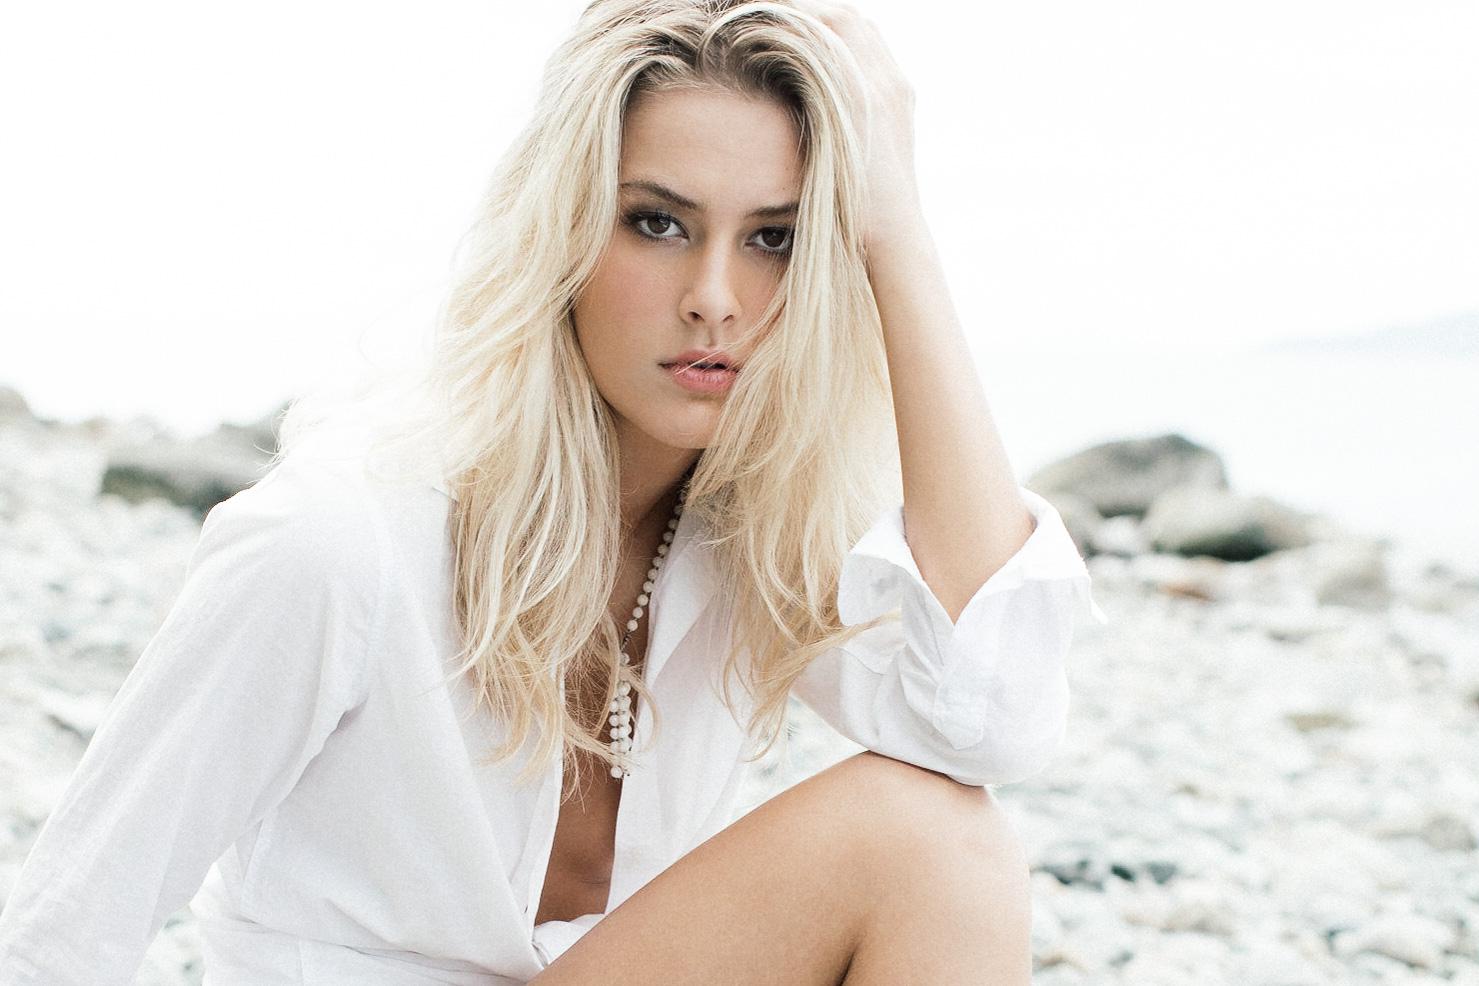 Model Corinne Isherwood on the beach in a white shirt.